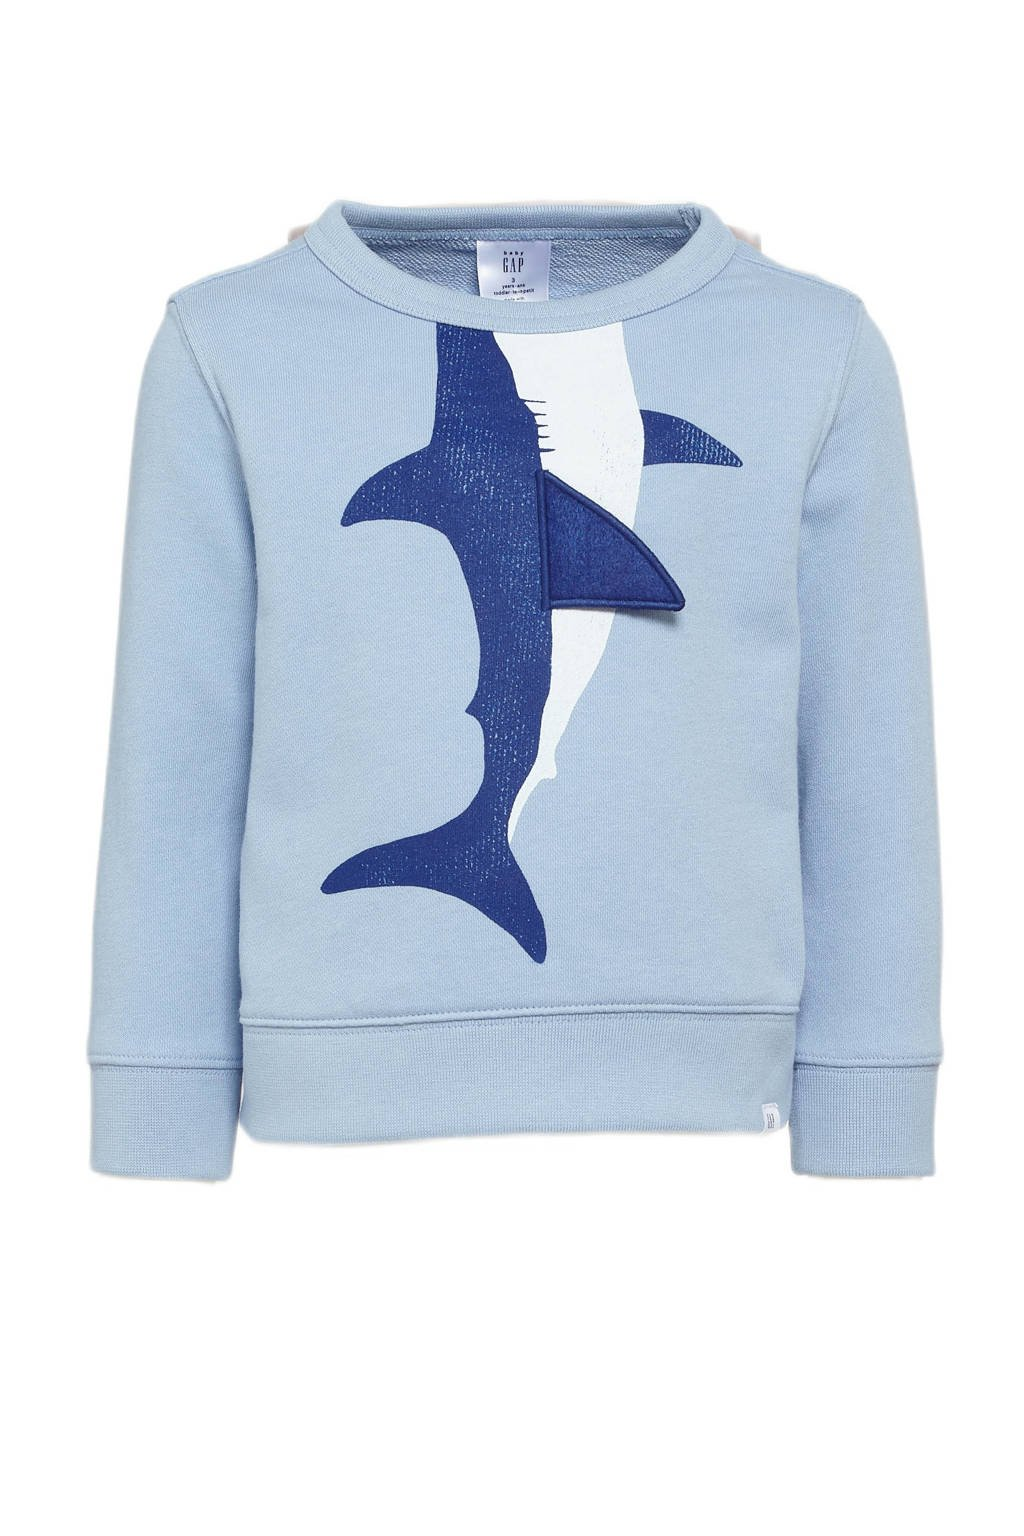 GAP sweater met printopdruk blauw, Blauw